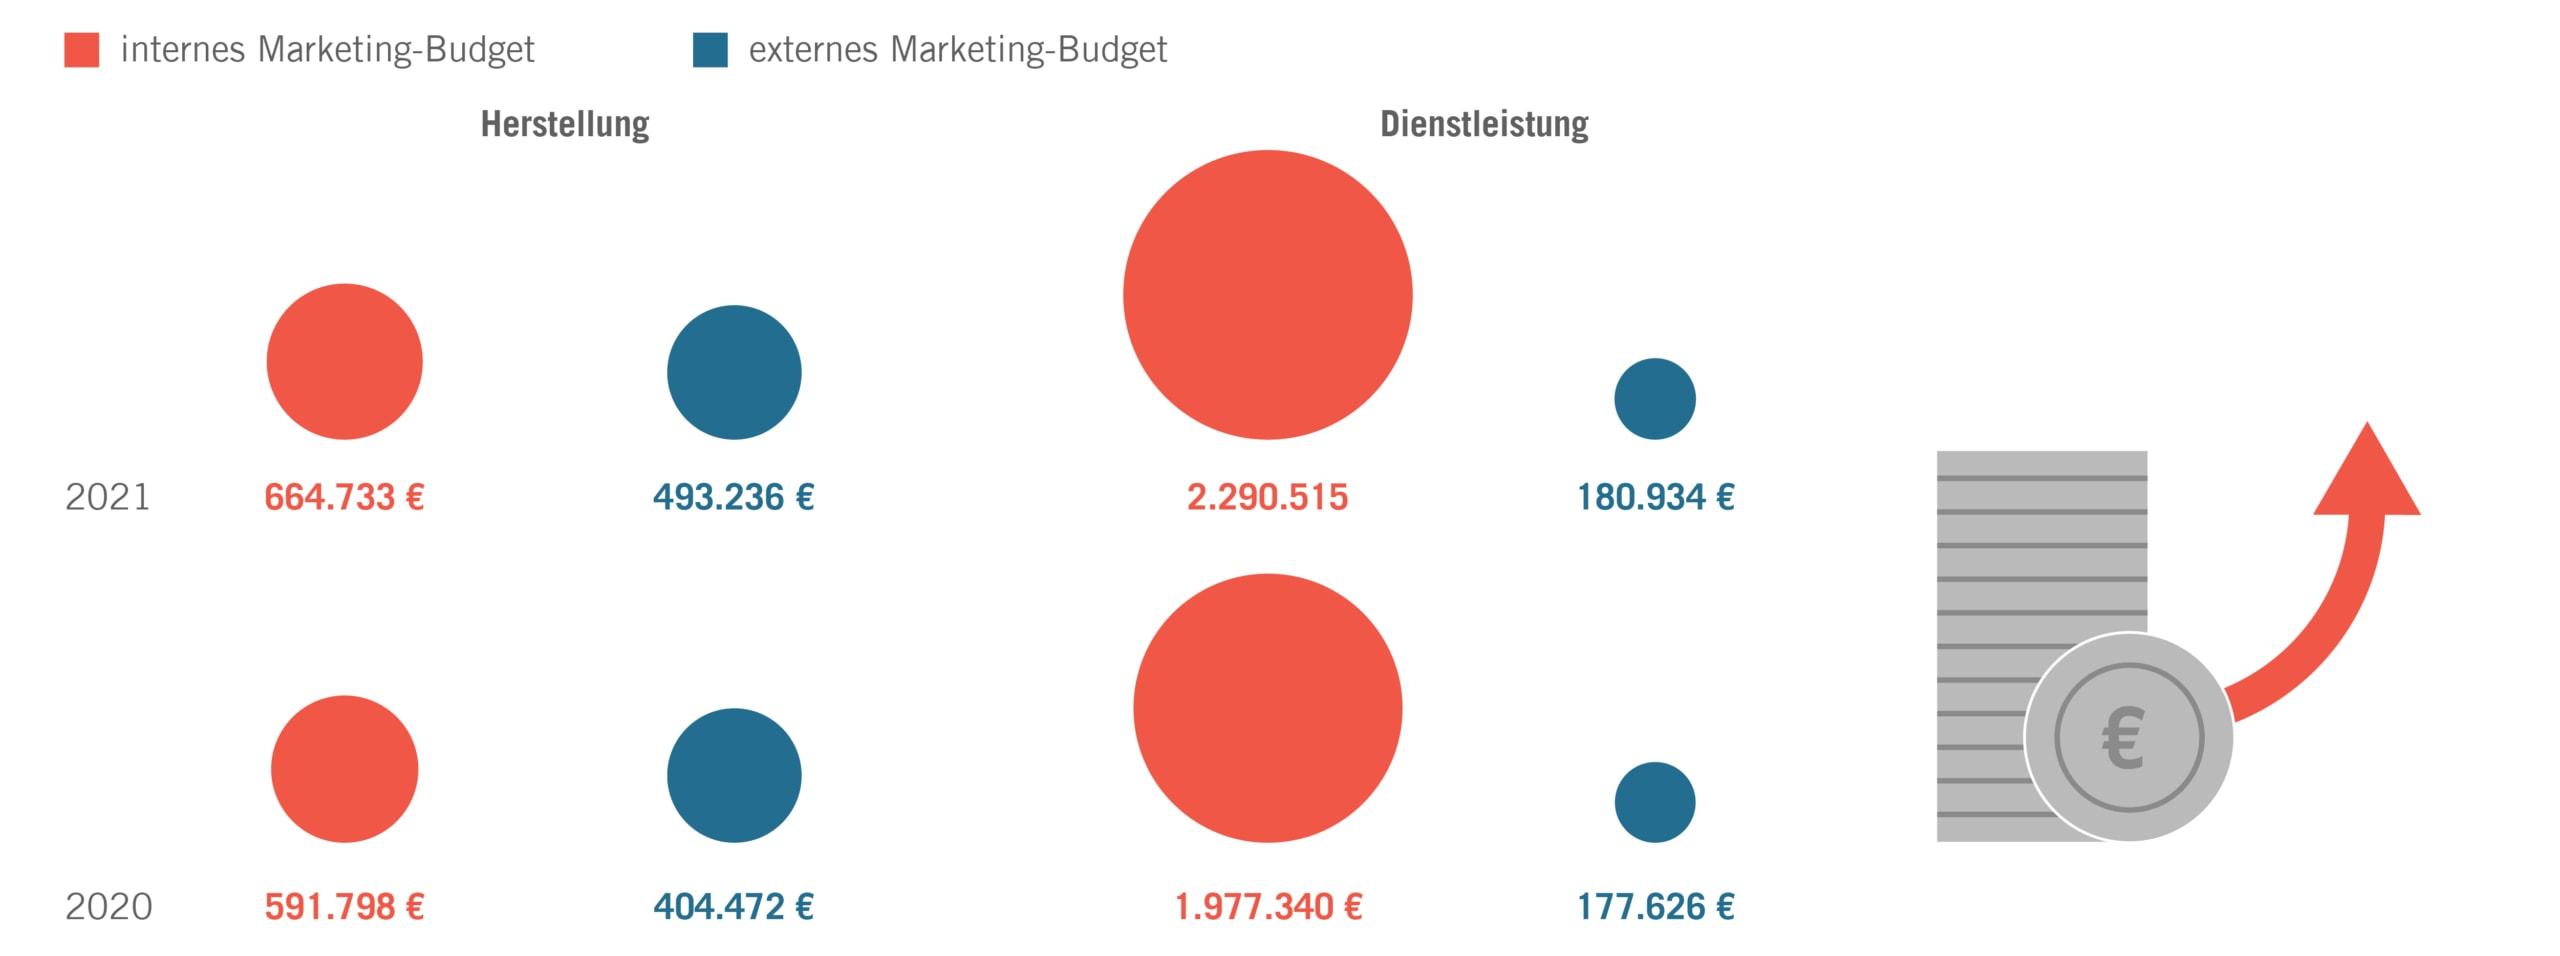 B2B-Marketing-Budgets 2021